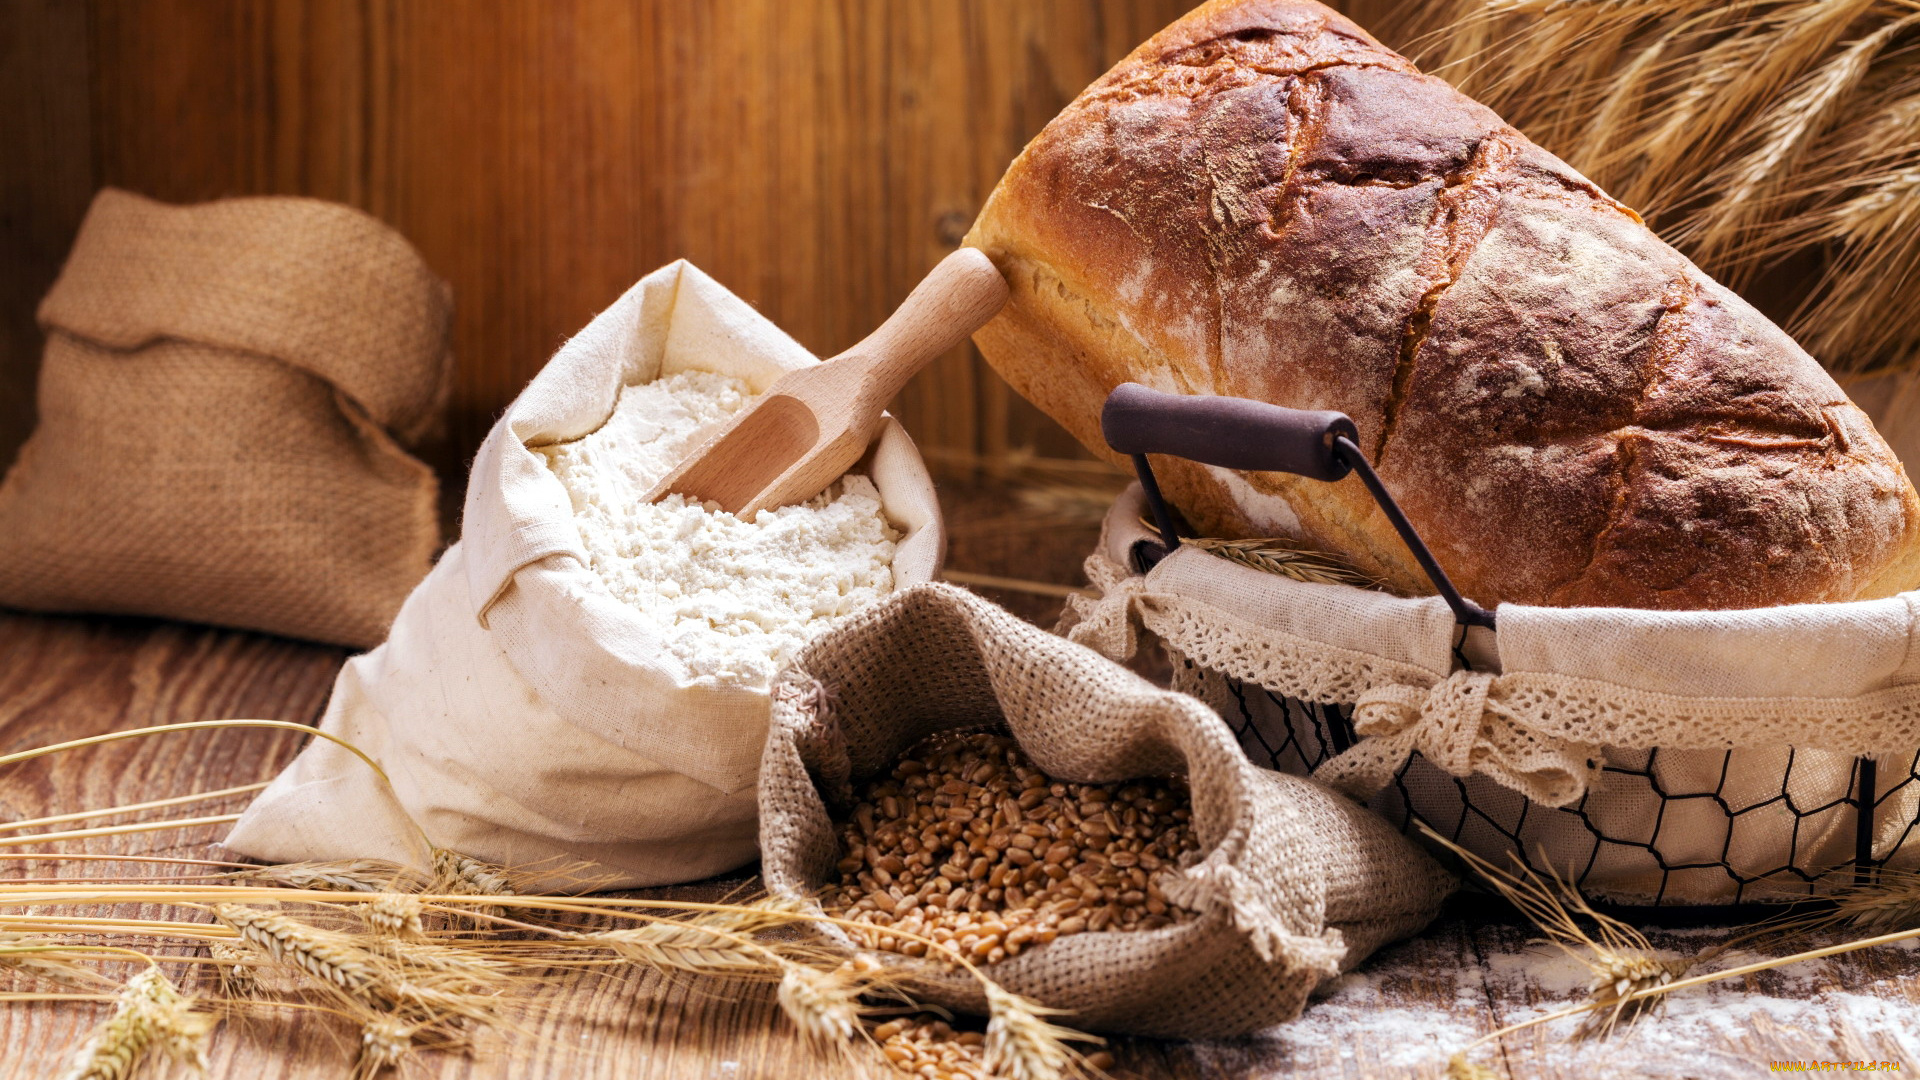 eda-hleb--vypechka-muka-1471286